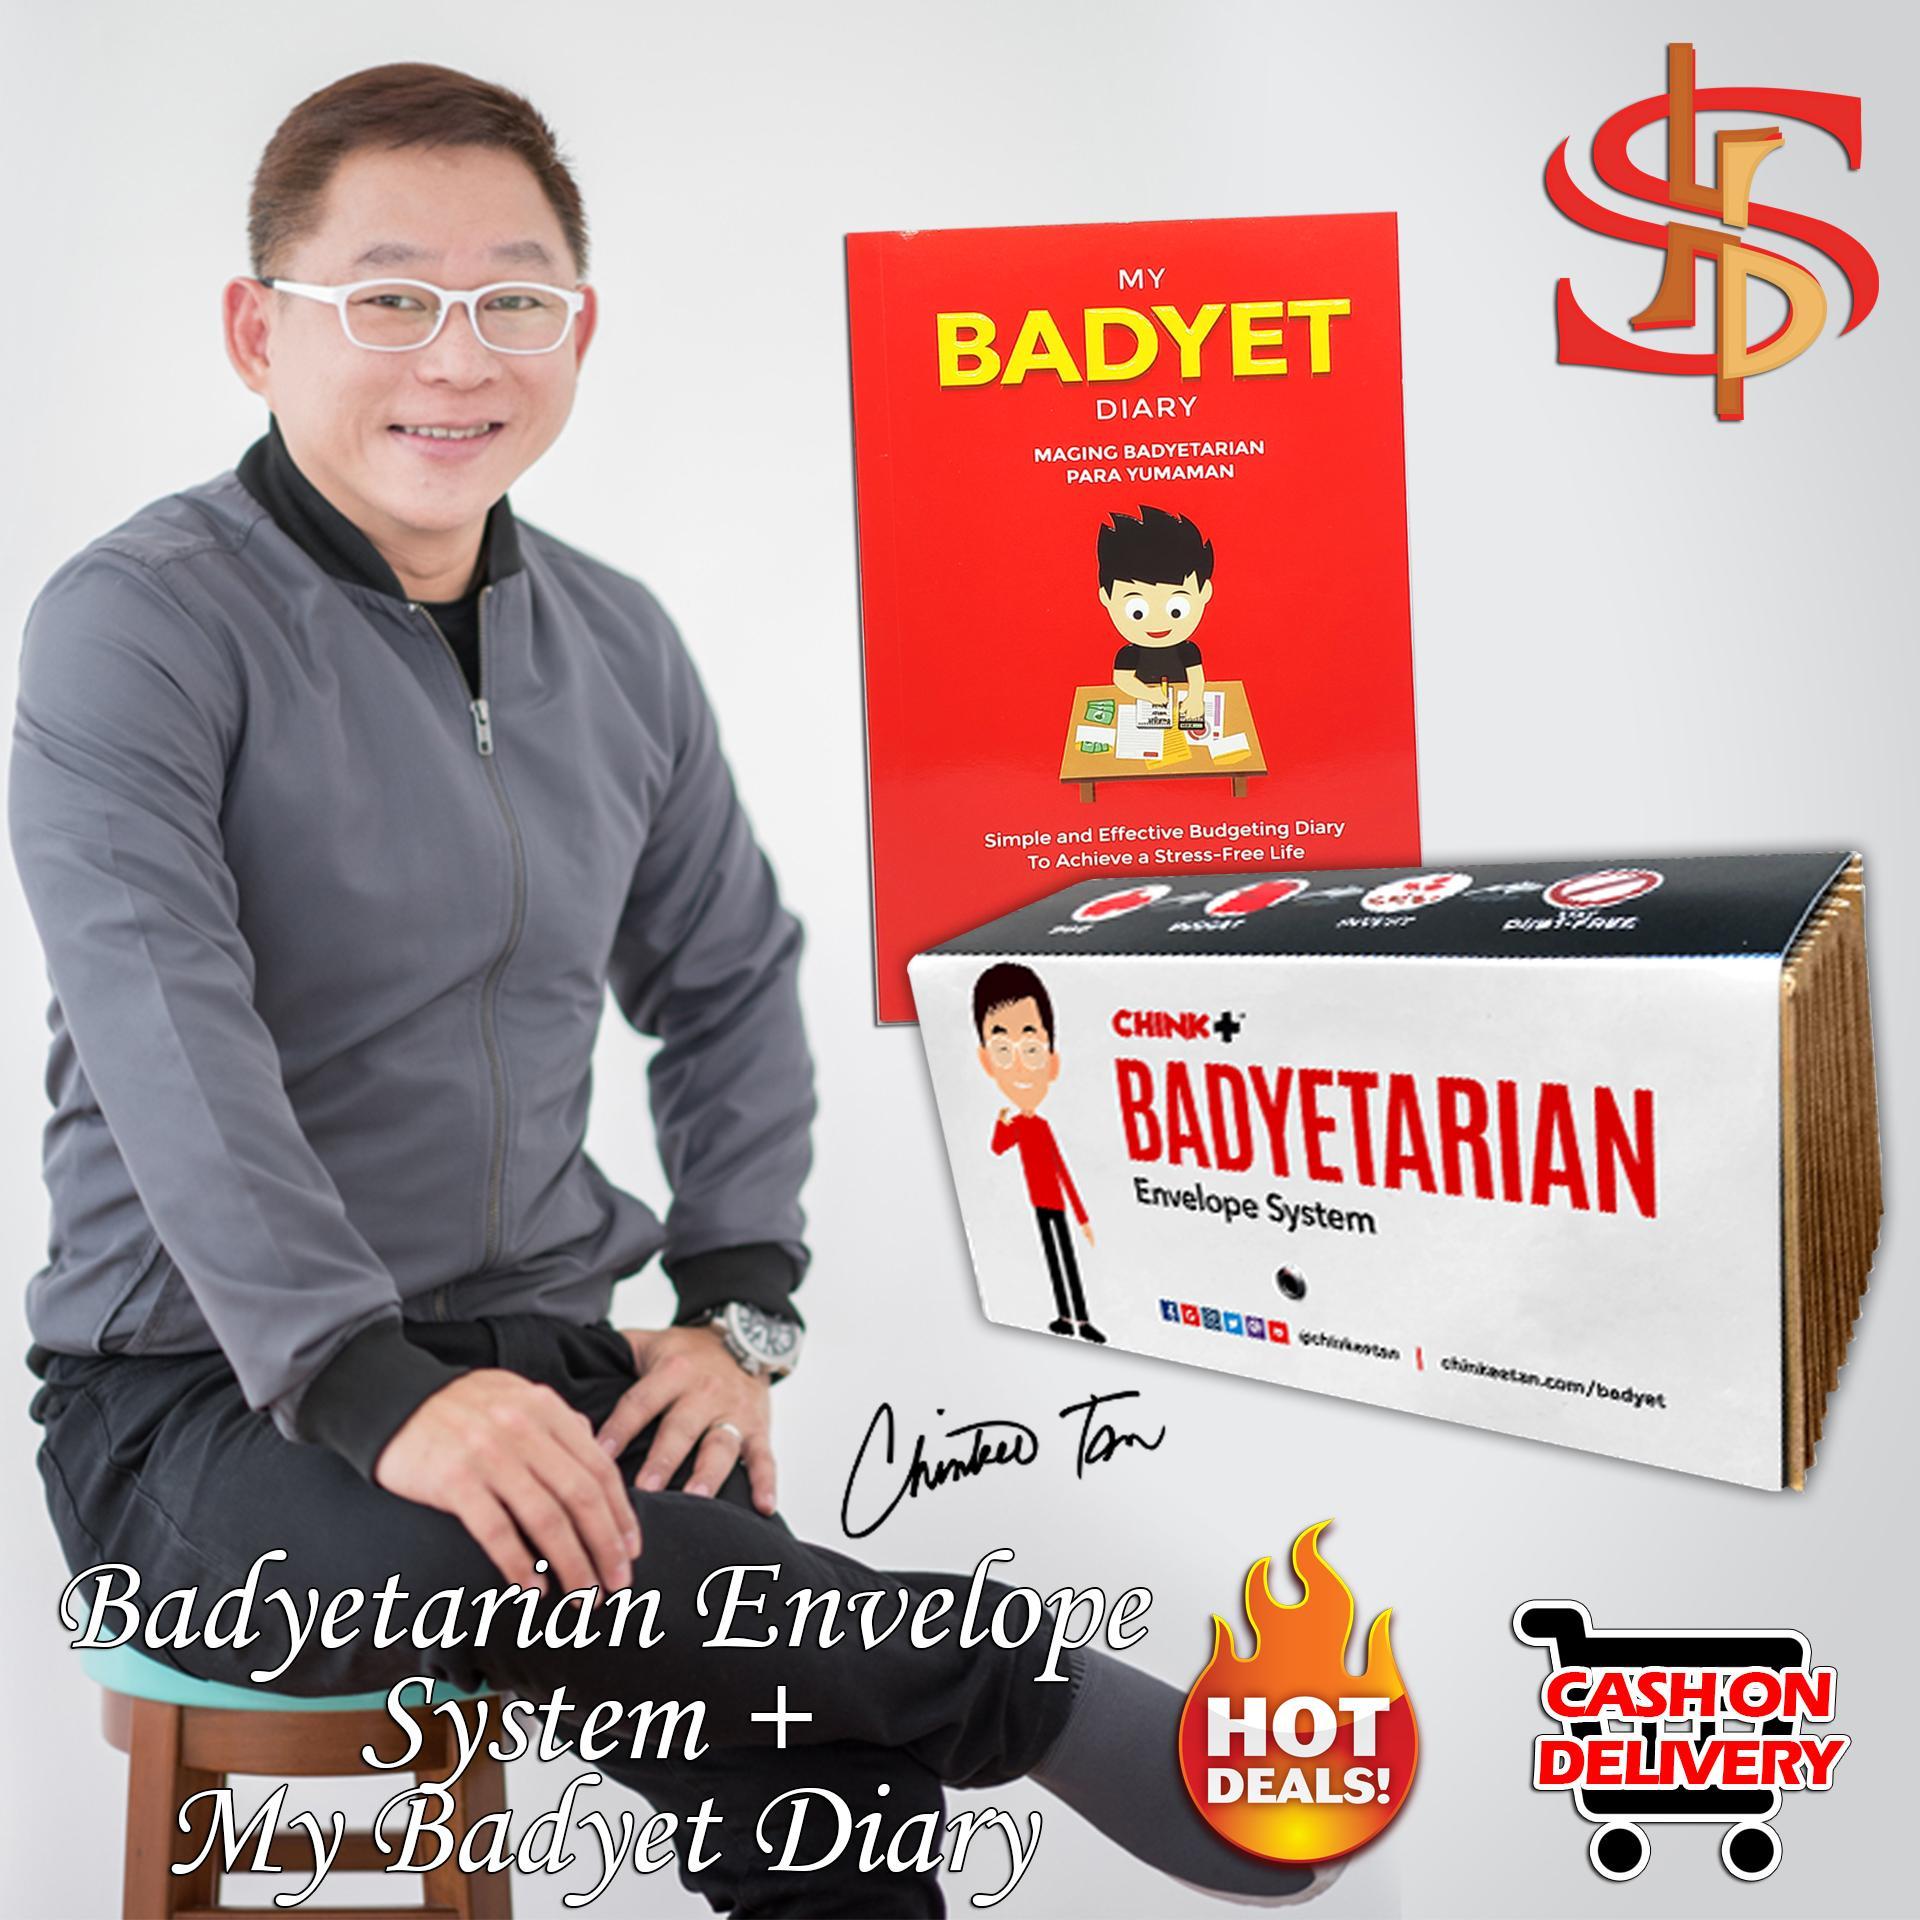 Badyetarian Envelope System + FREE My Badyet Diary book By Chinkee Tan